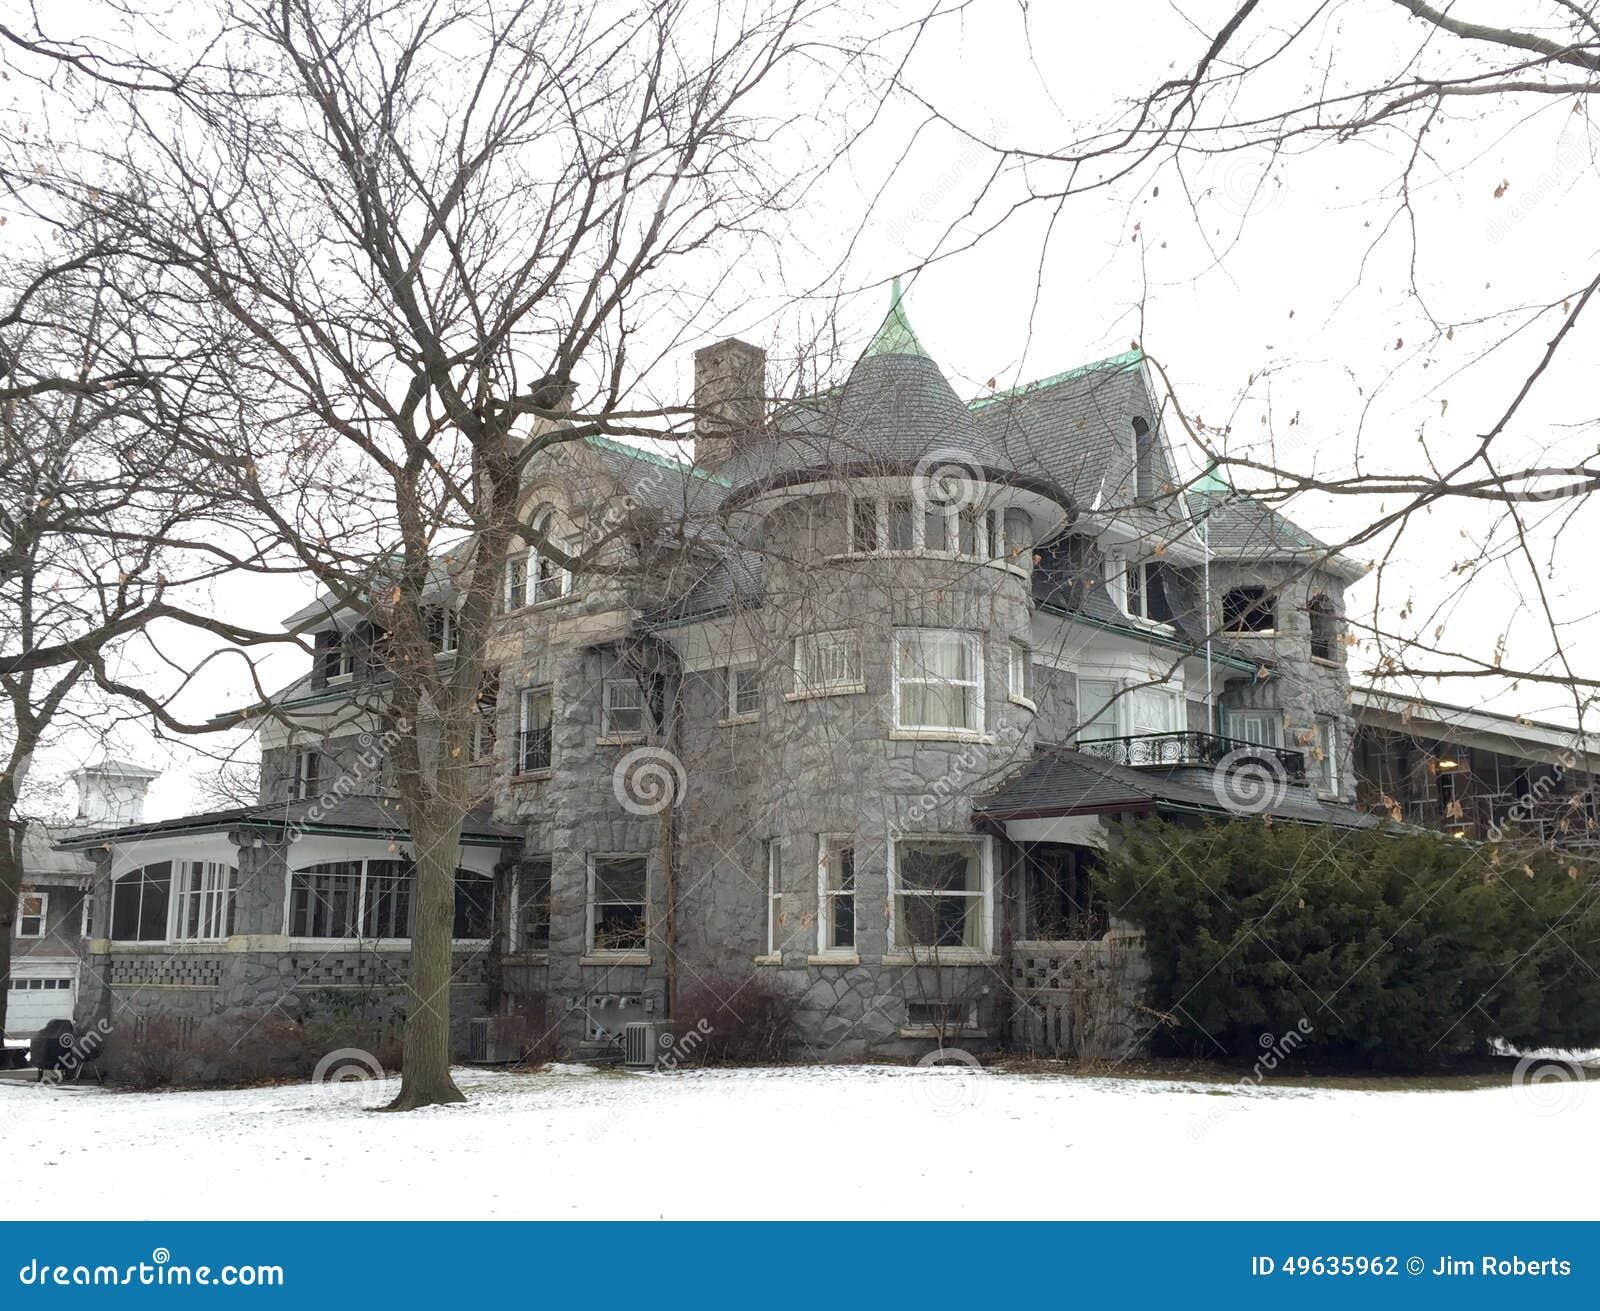 Evanston Stone Mansion Editorial Photography Image 49635962